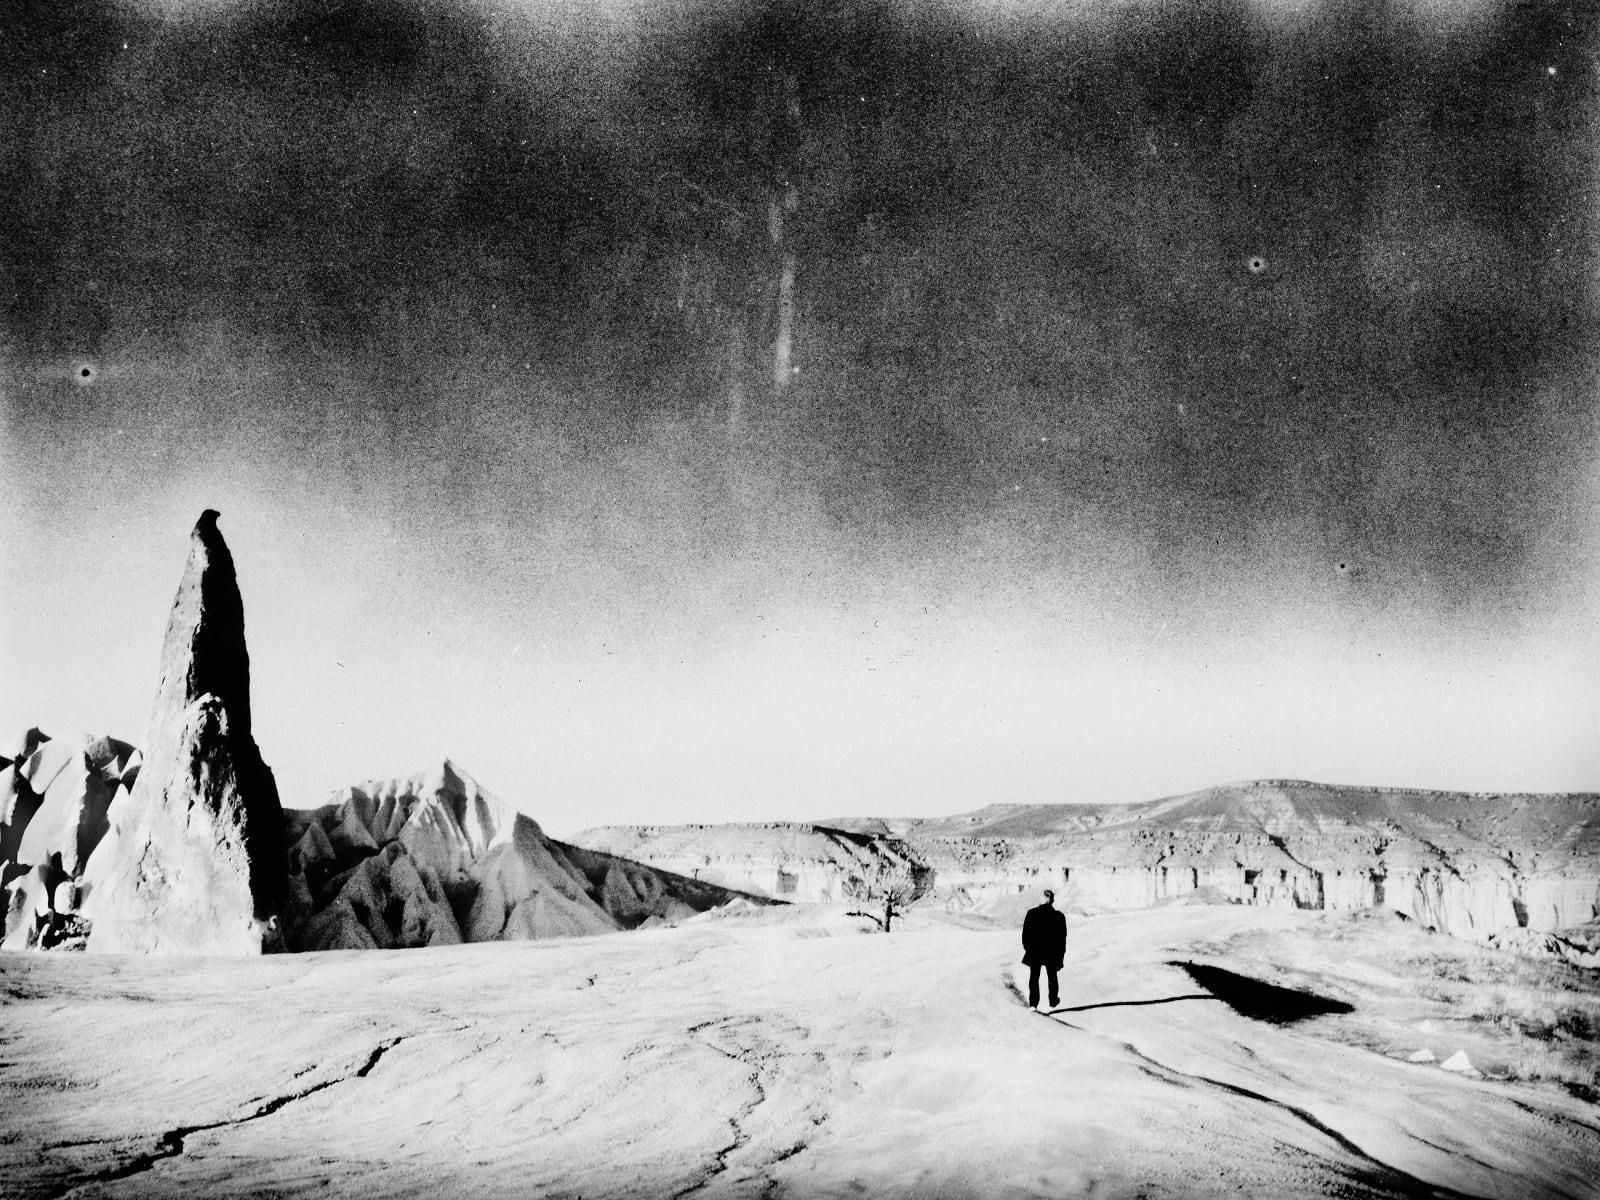 Andrej Lamut, Shadowalker, 2014